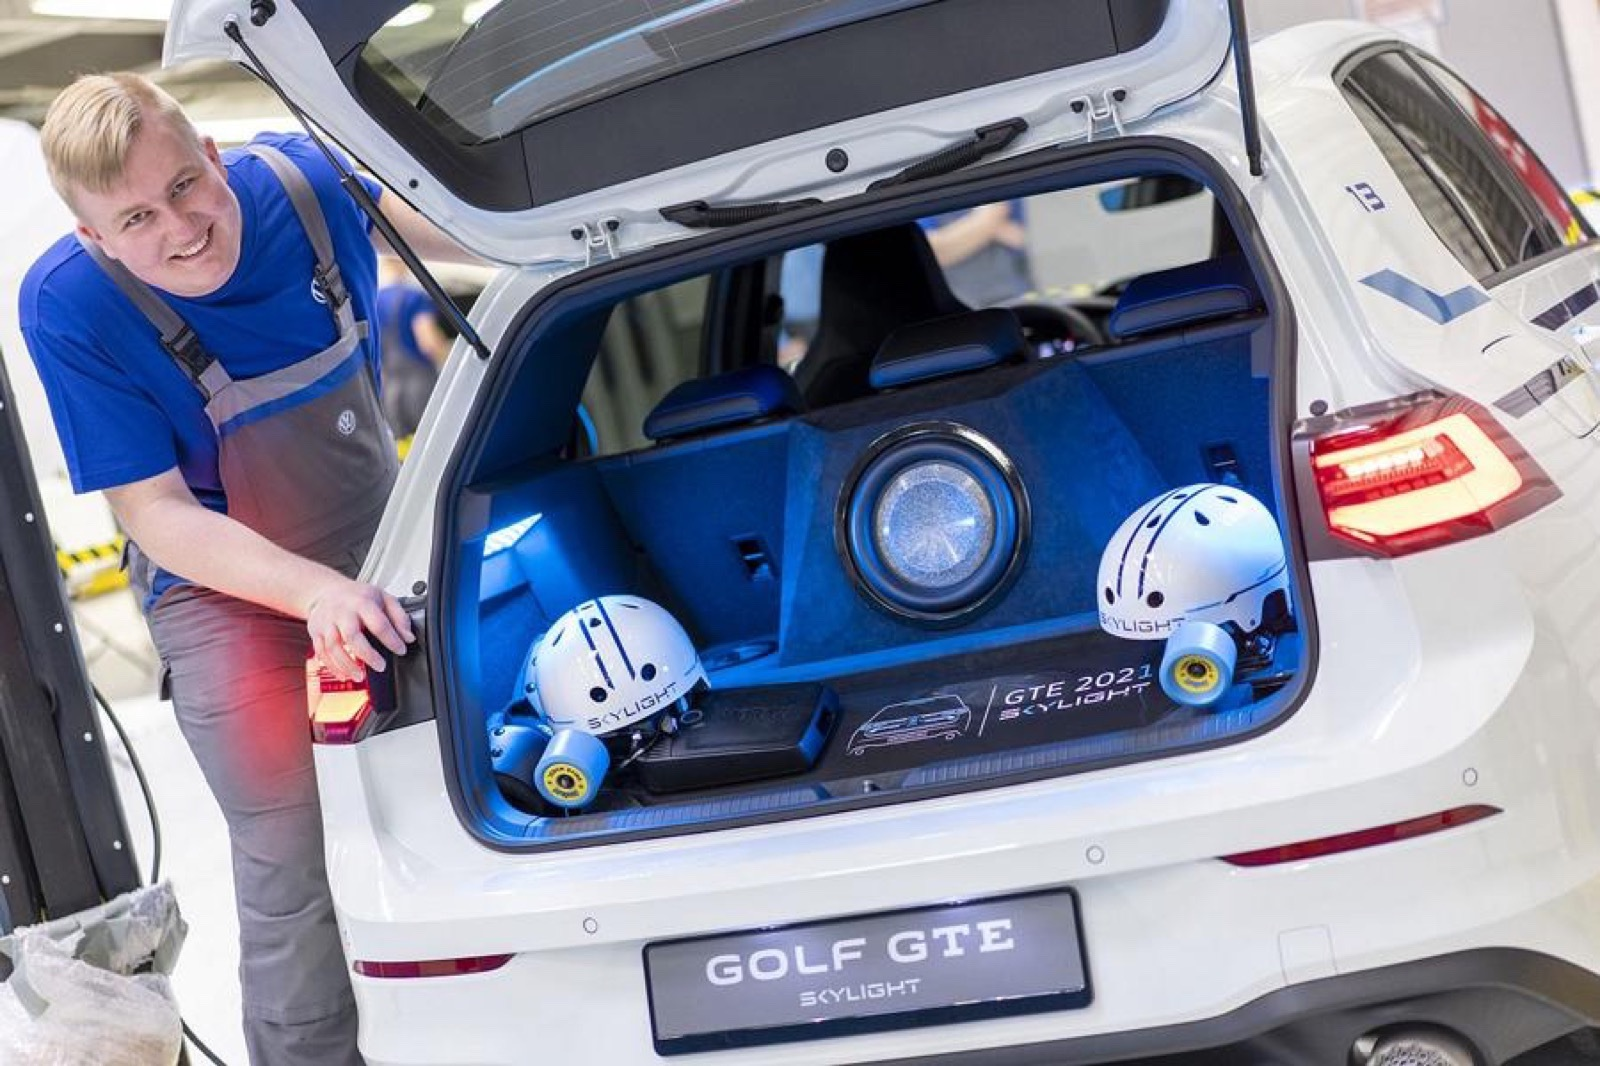 Volkswagen_Golf_GTE_Skylight-0004